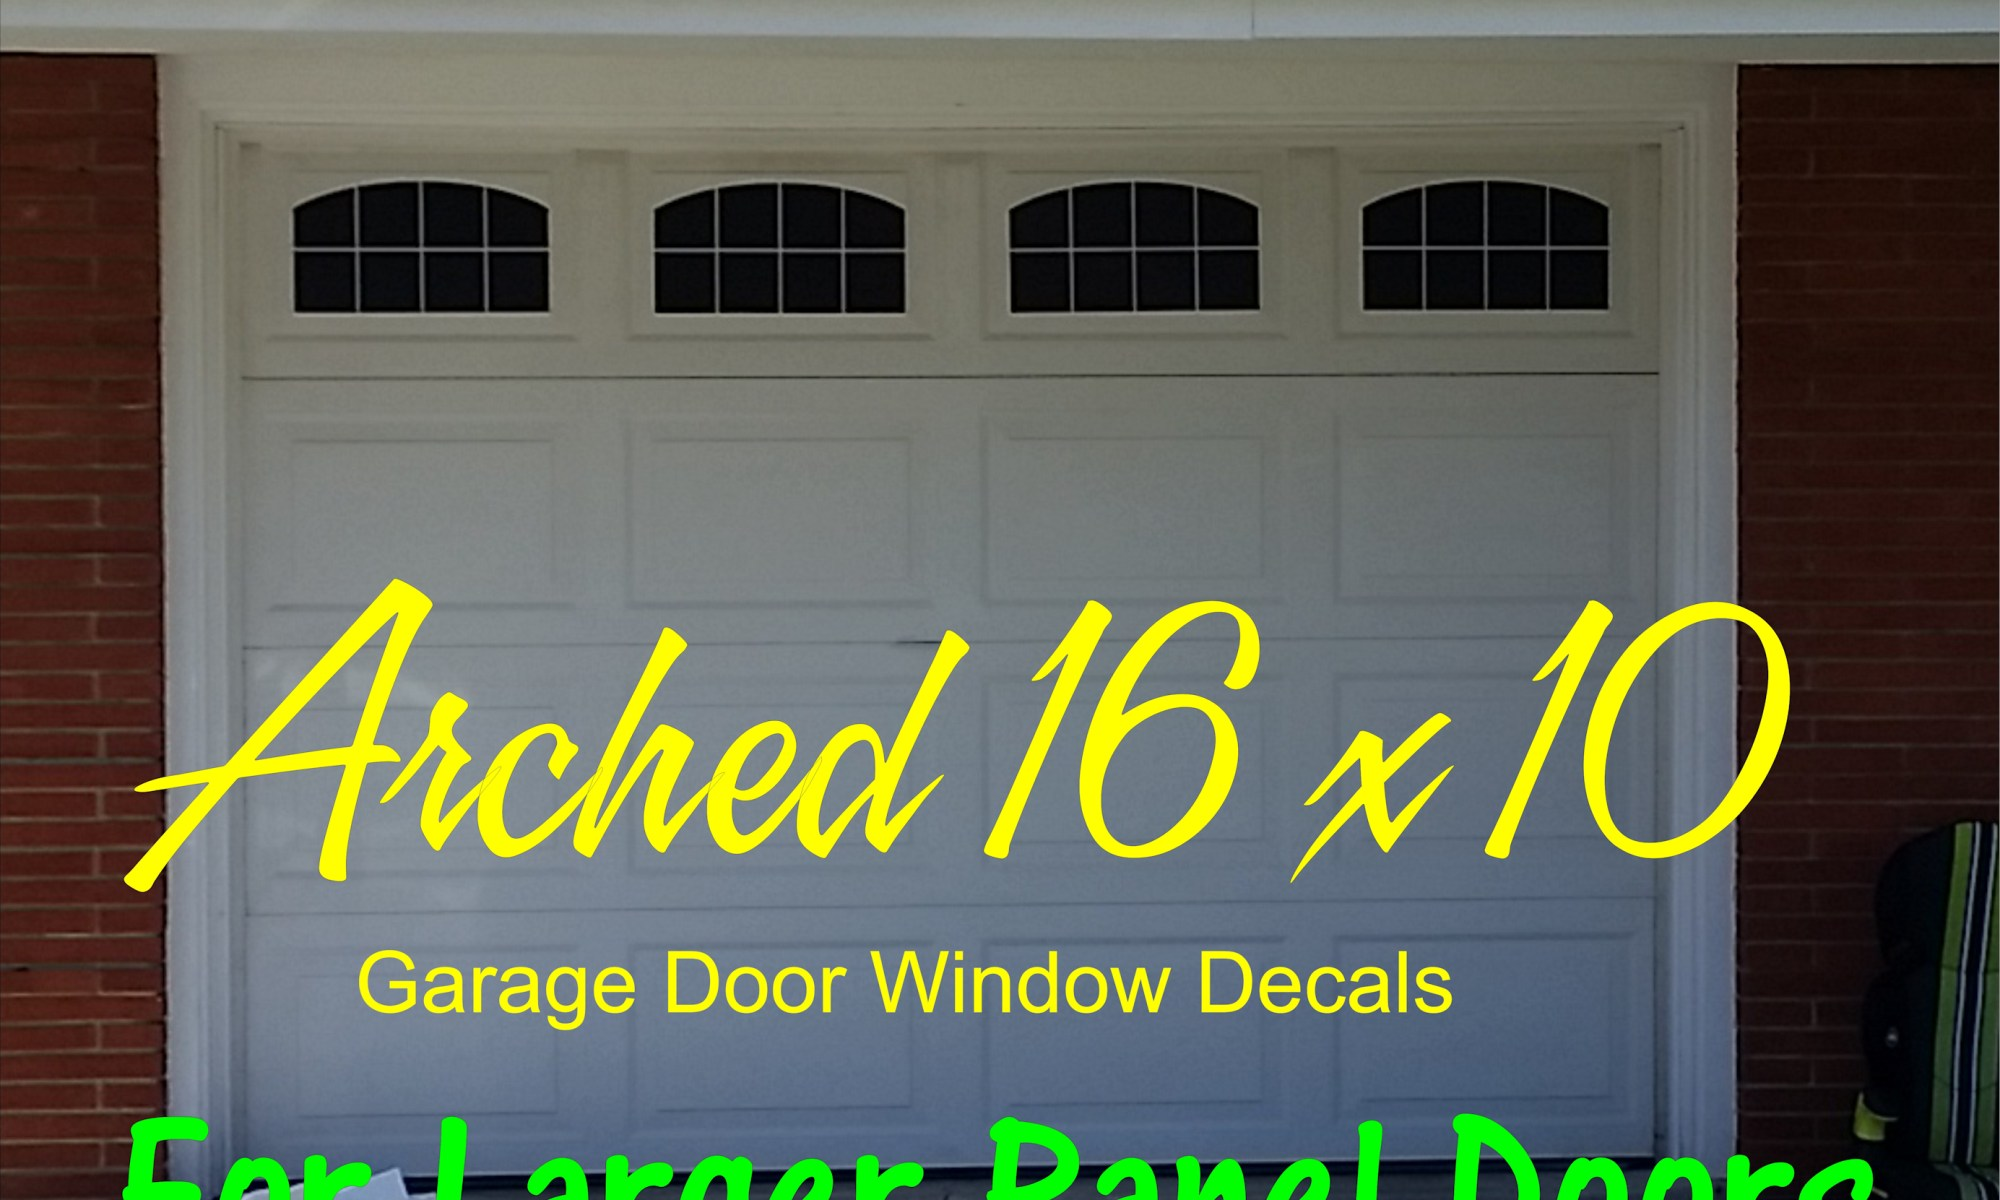 Faux Garage Door Windows Arched Style 16 X 10 Faux Window Garage Door Vinyl Decals Garage